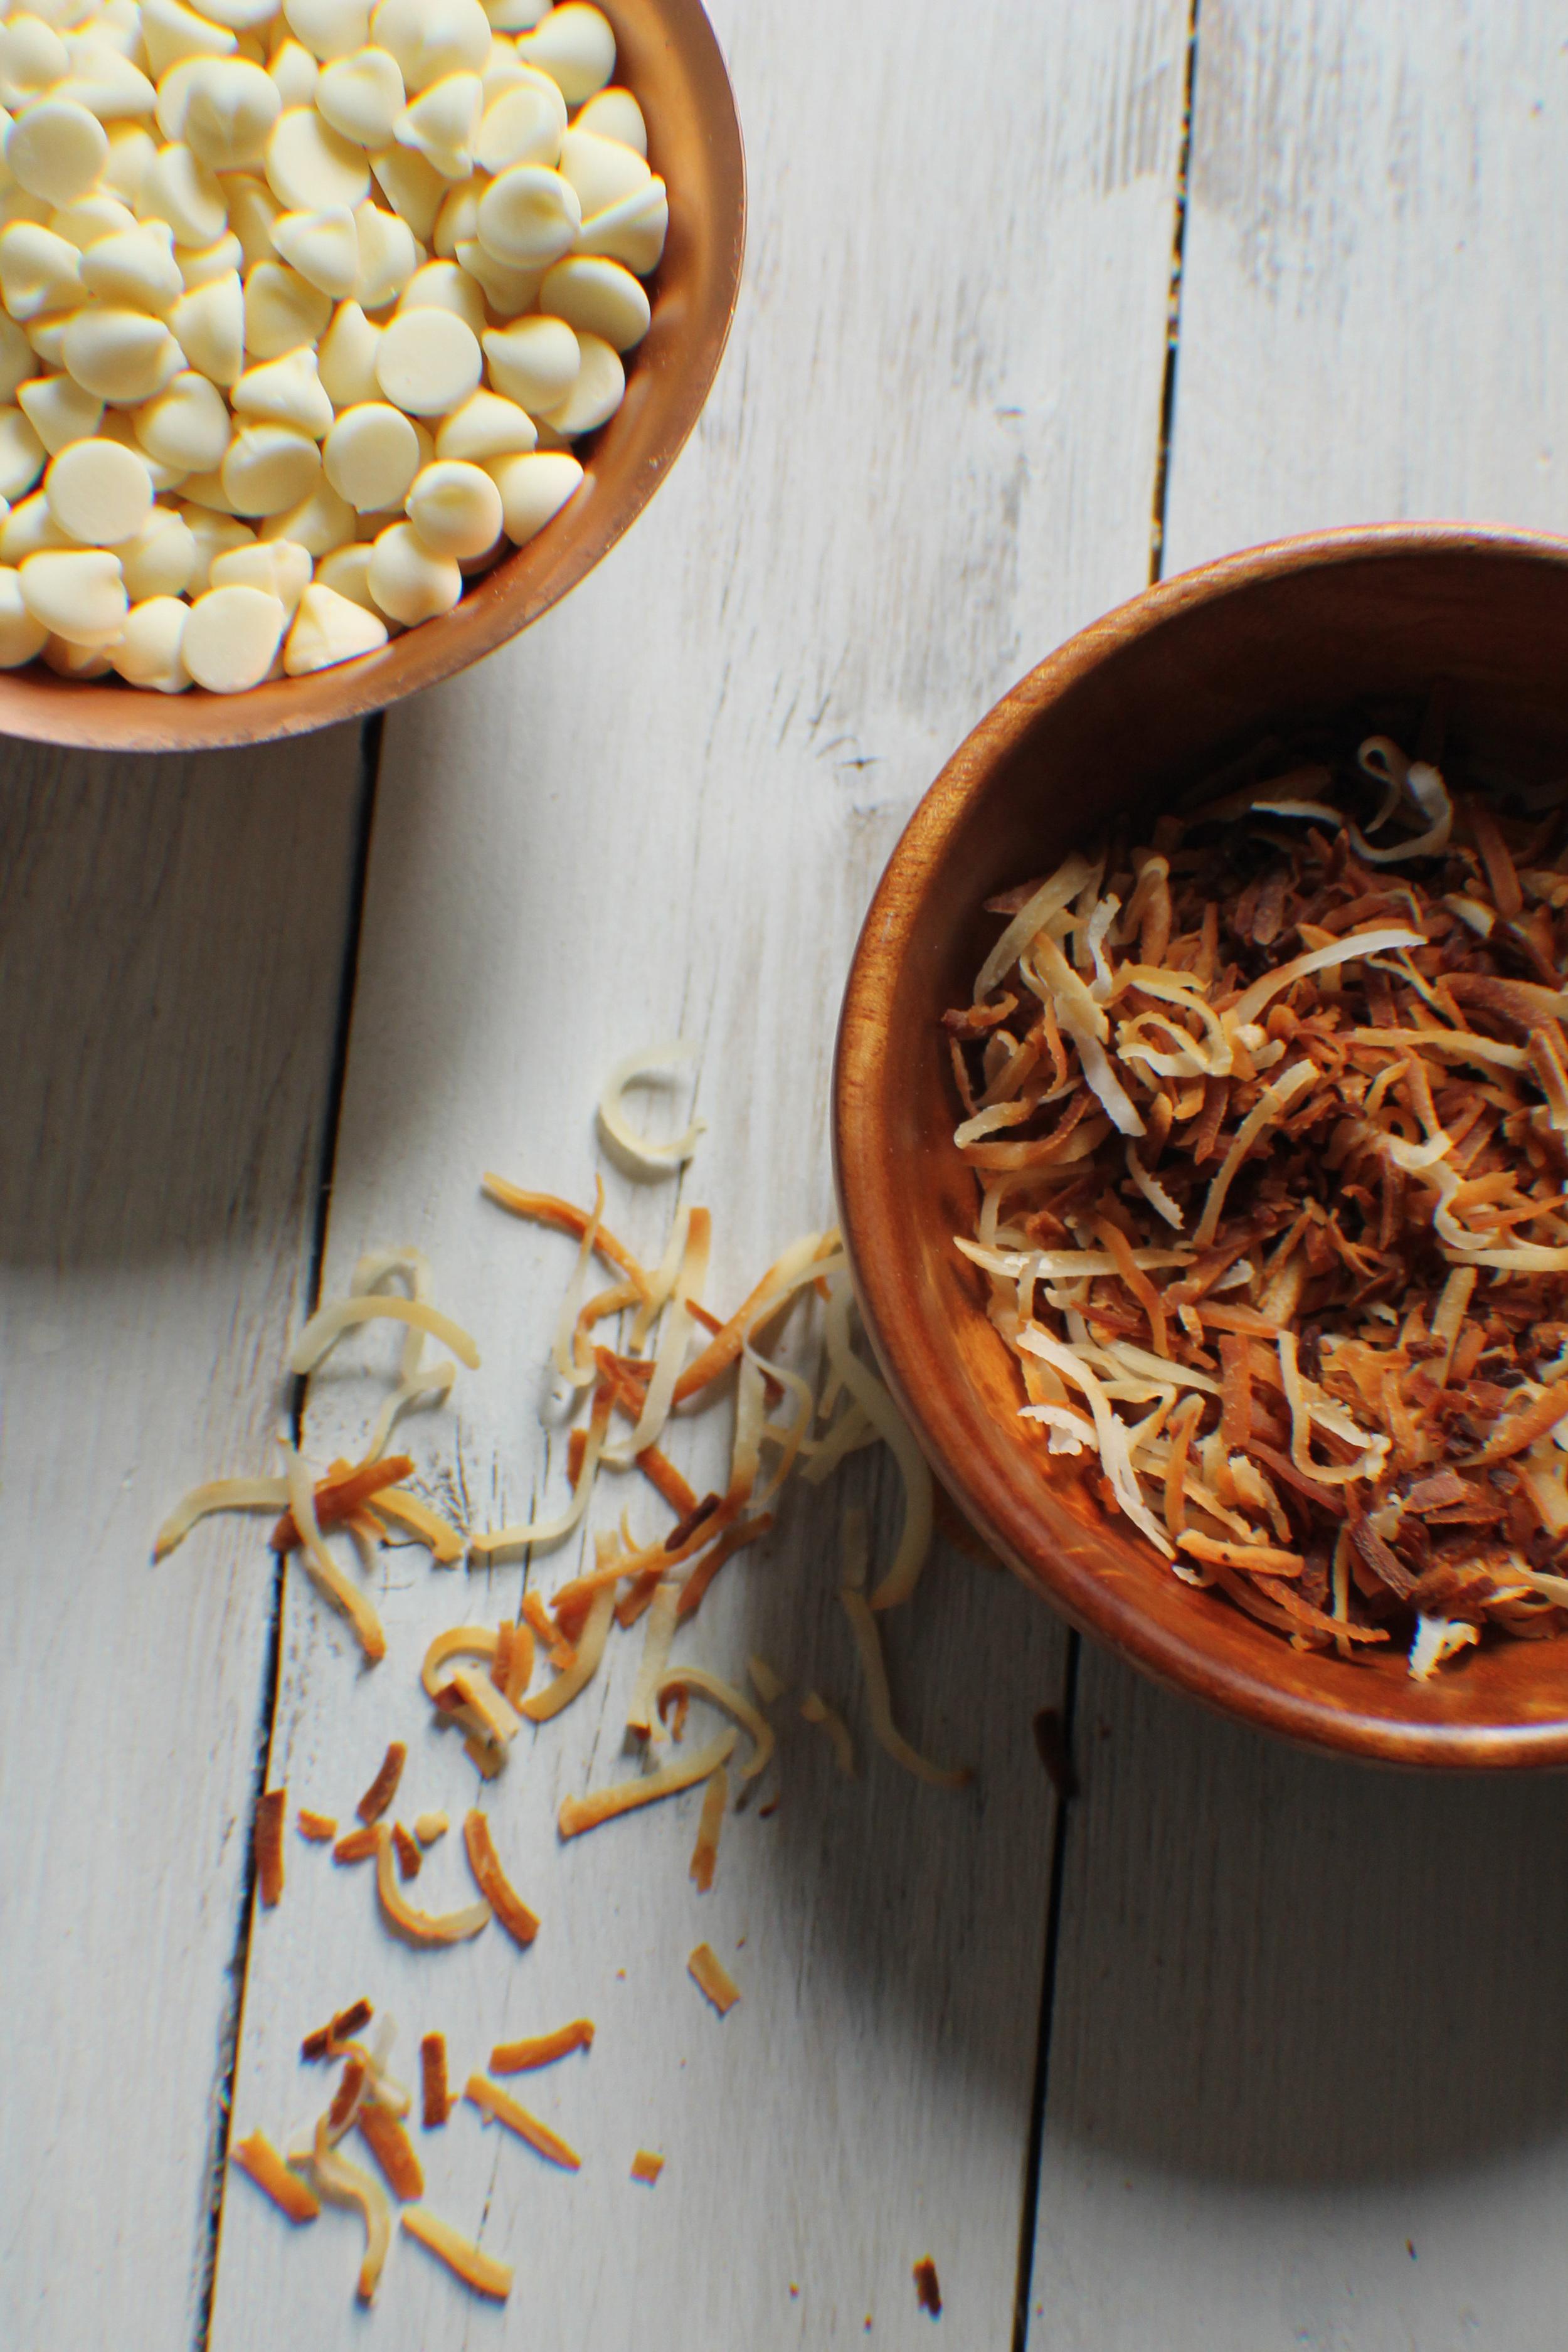 Toasted Coconut & Macadamia Nut Brittle {Pedantic Foodie}